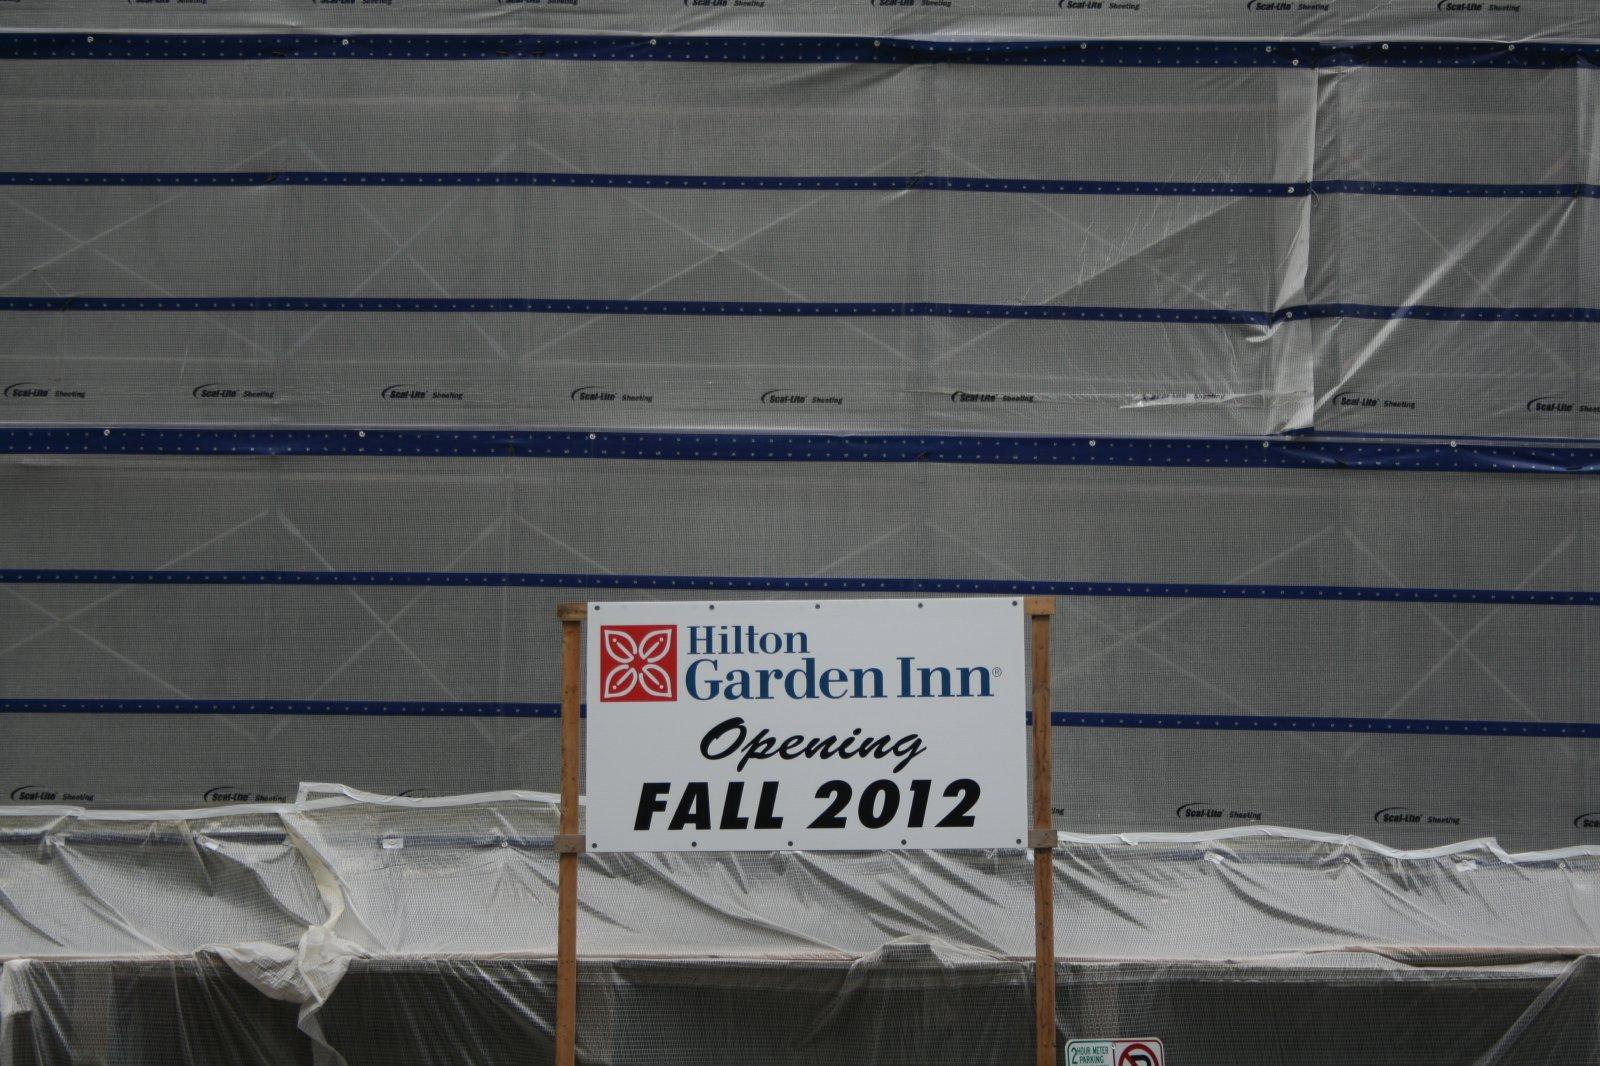 Hilton Garden Inn - Fall 2012